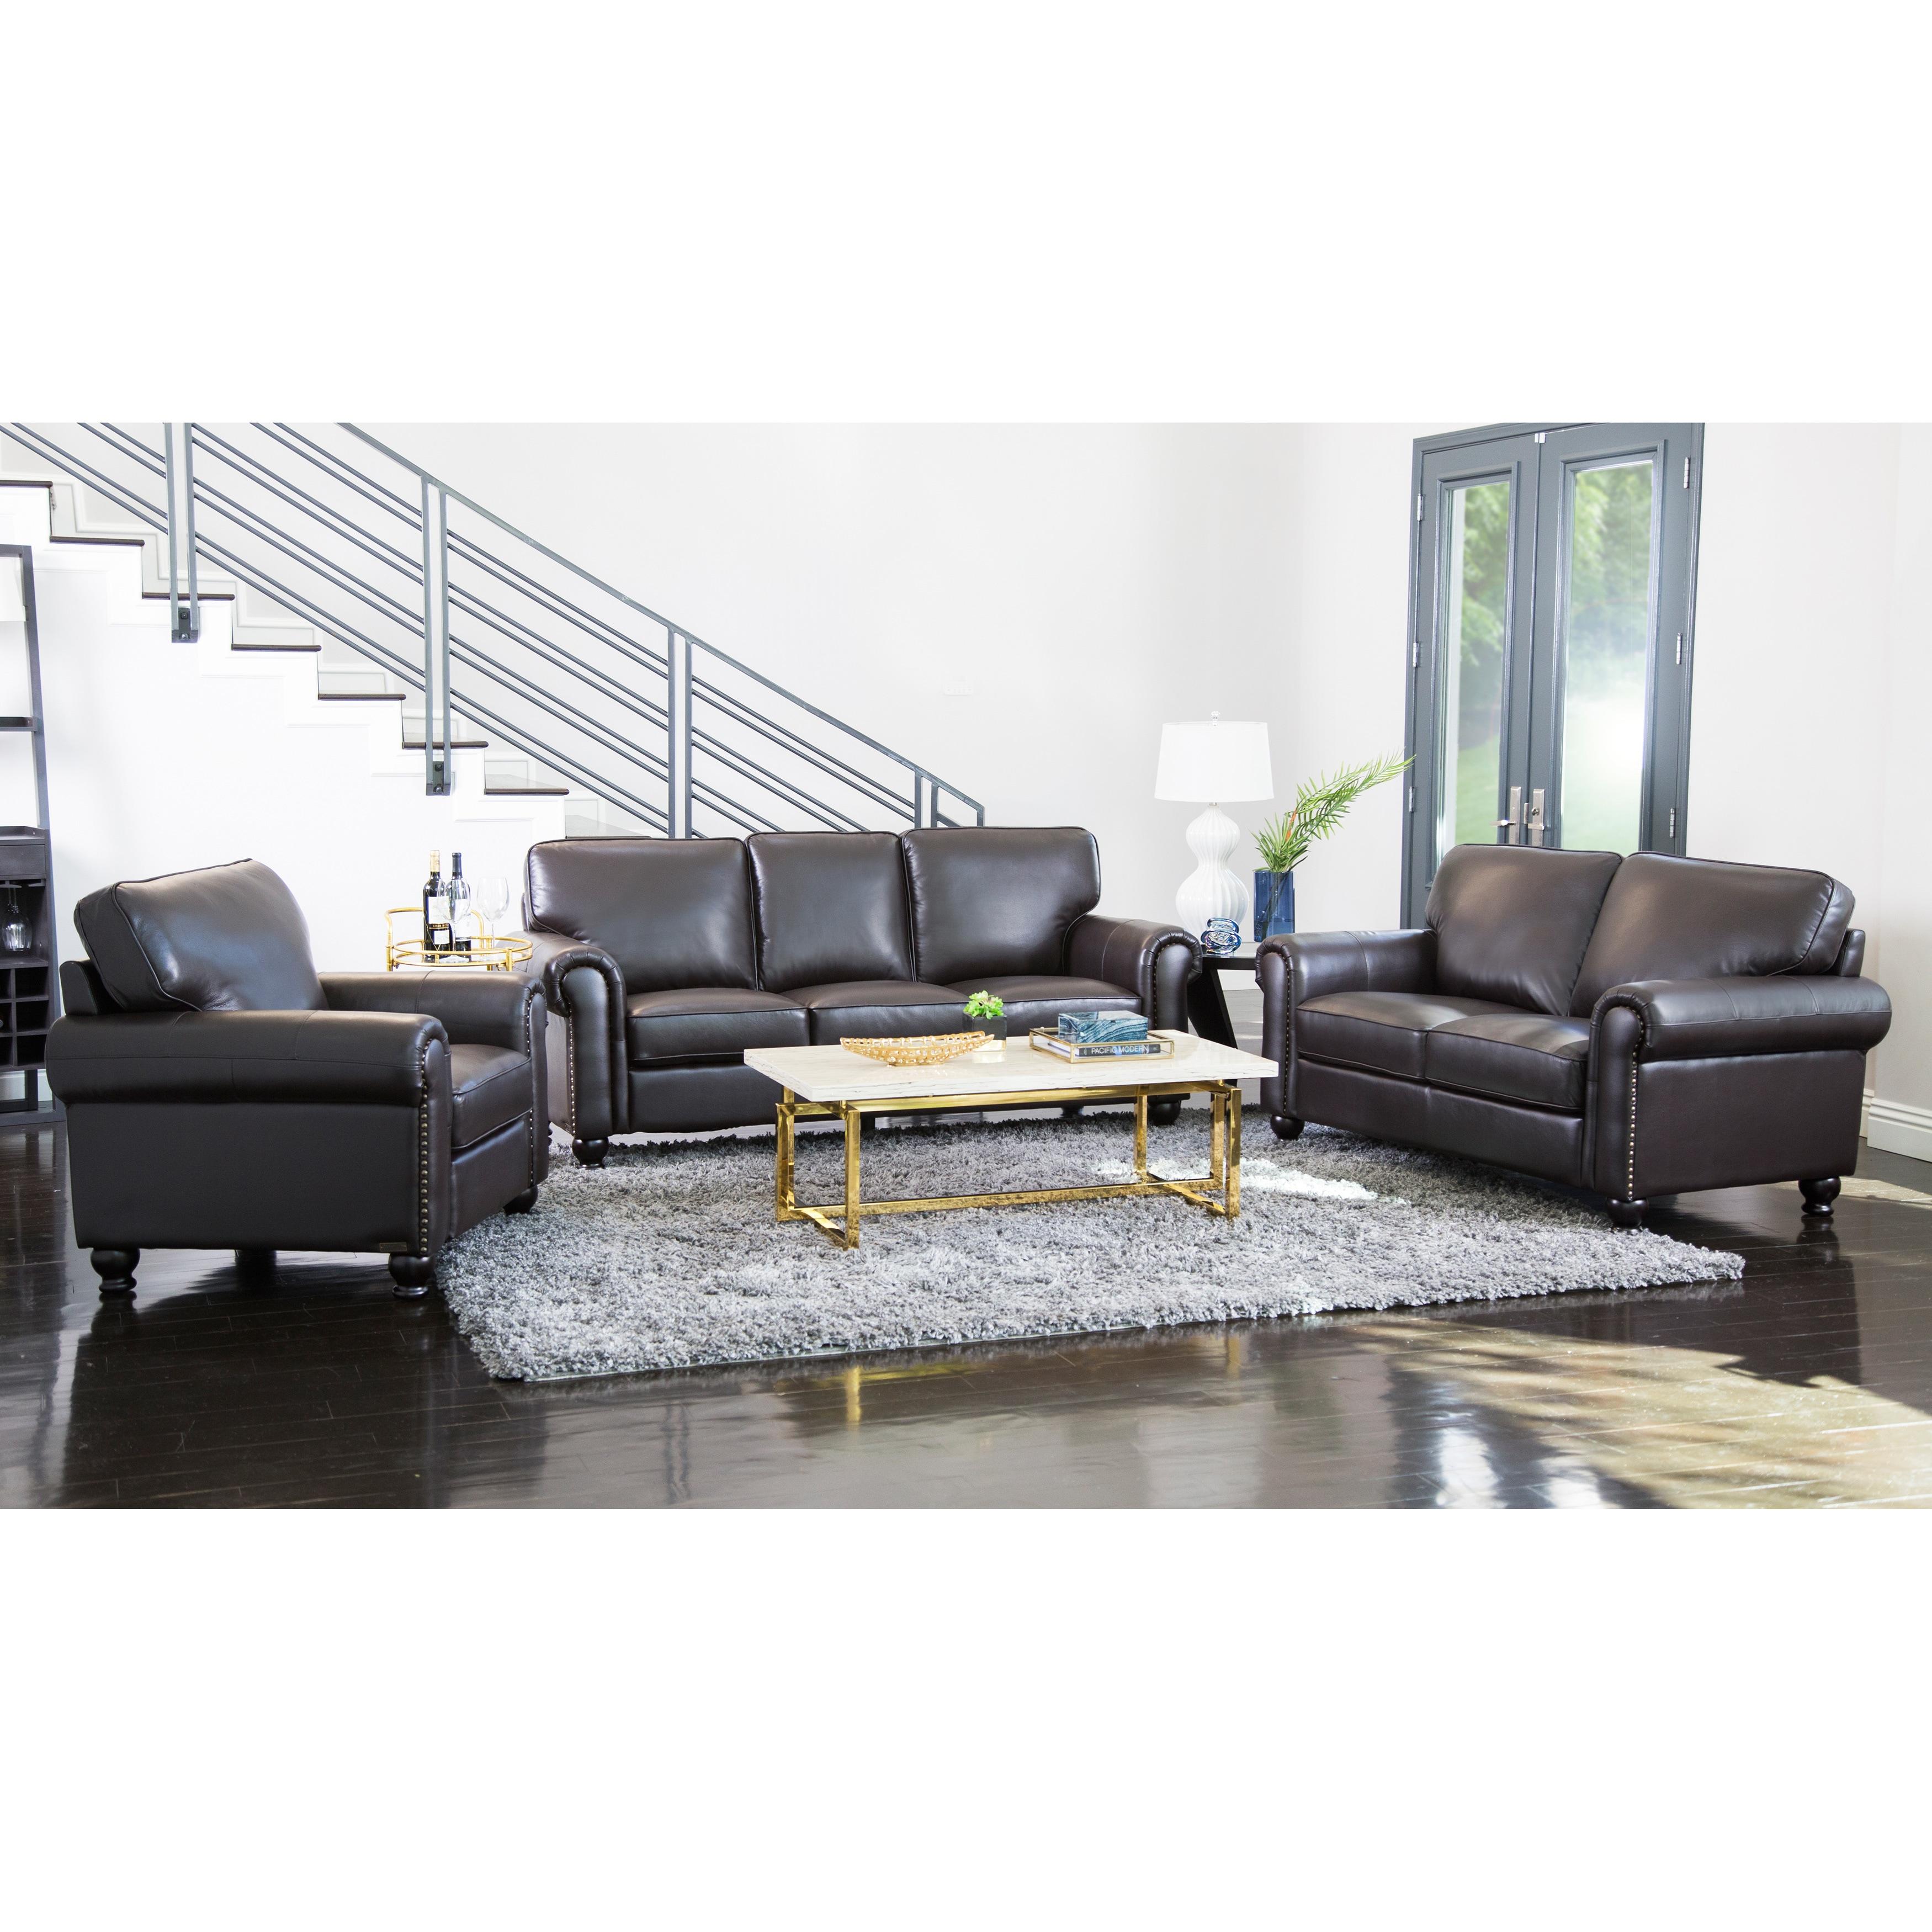 Abbyson London Top-grain Leather Living Room Sofa Set - Free ...